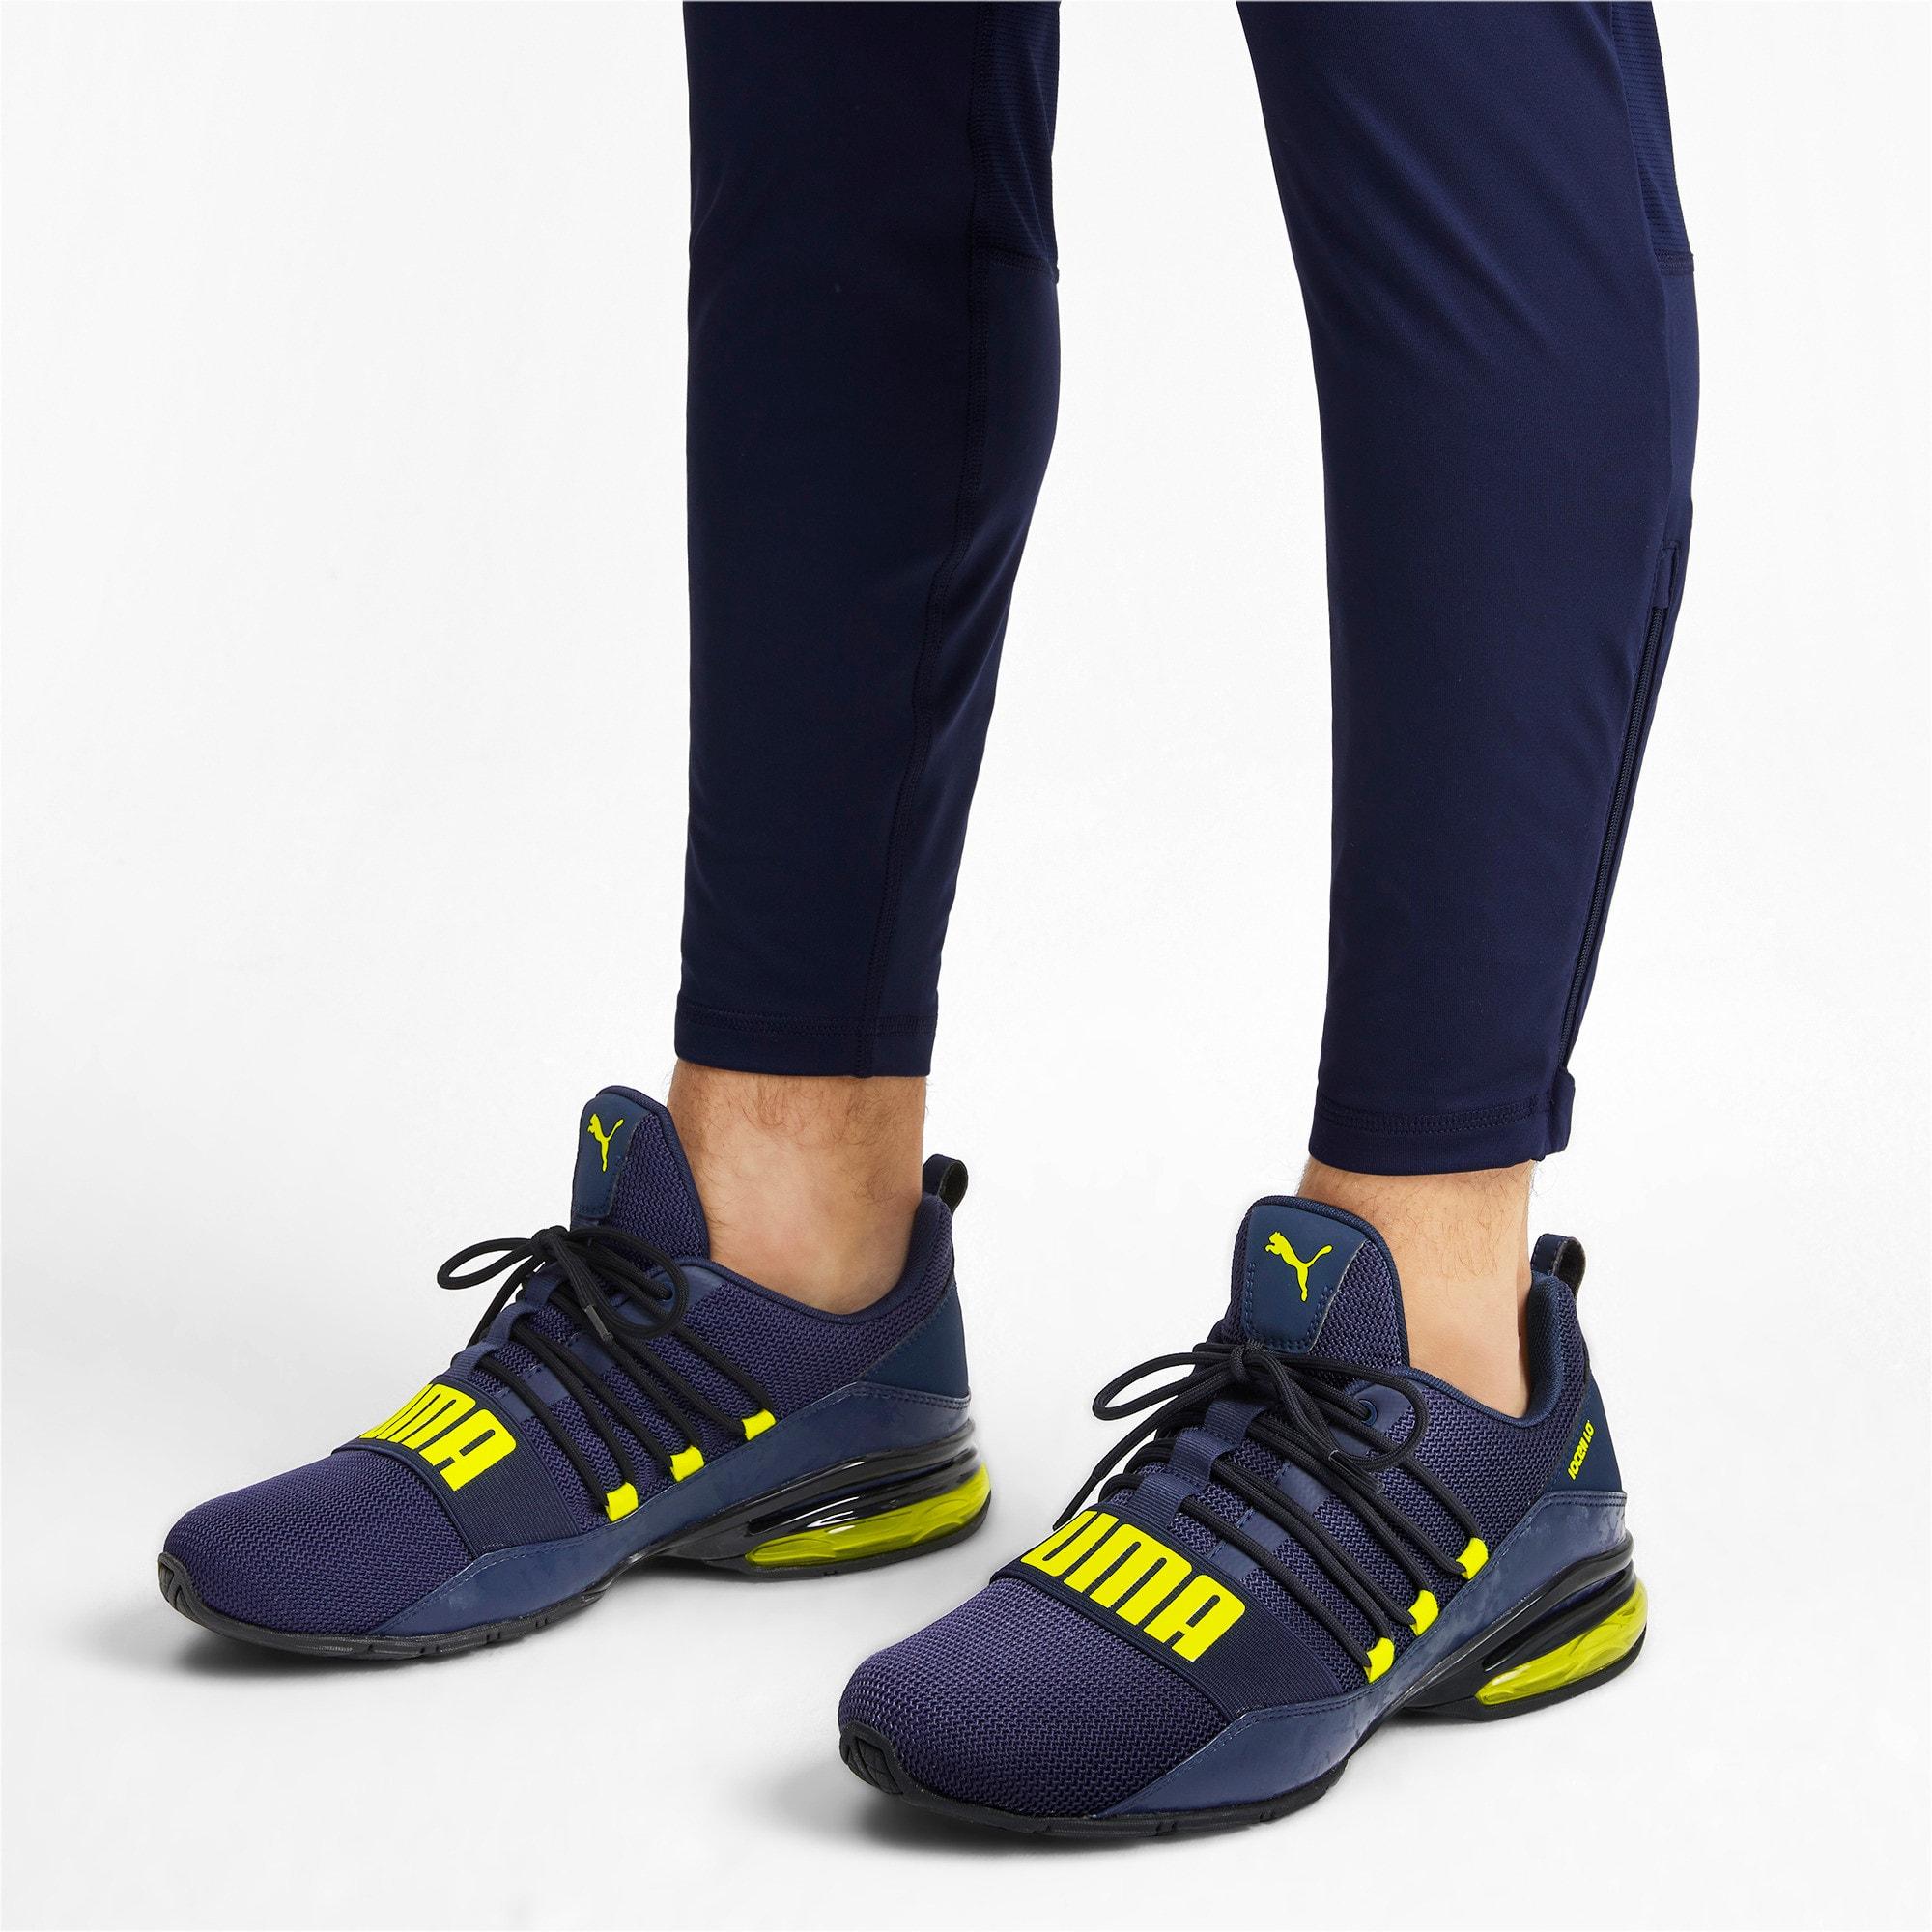 Thumbnail 3 of Cell Regulate Camo Men's Running Shoes, Peacoat-Yellow Alert, medium-IND